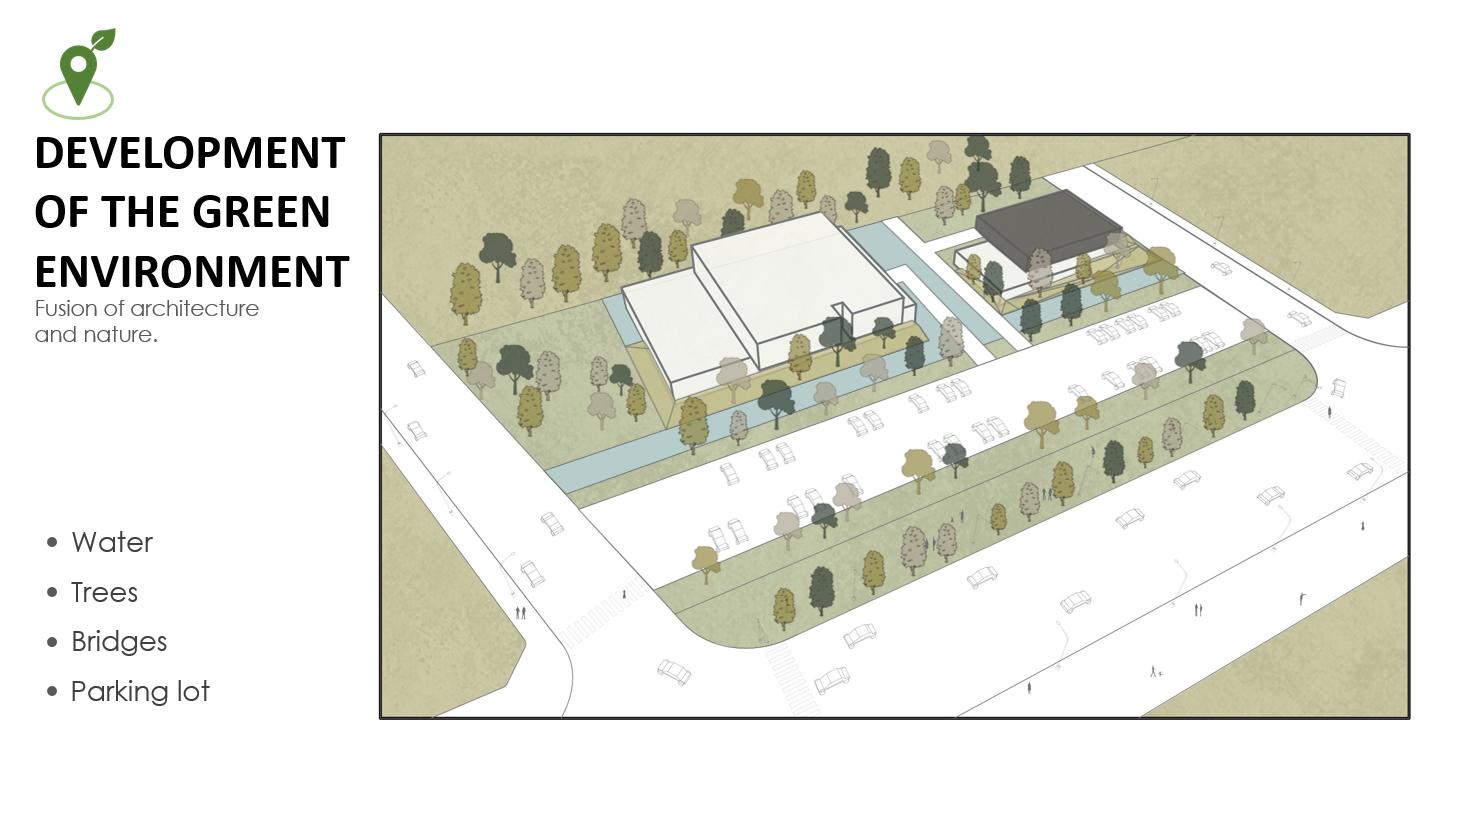 DEVELOPMENT OF THE GREEN ENVIRONMENT Chain10 Architecture & Interior Design Institute}